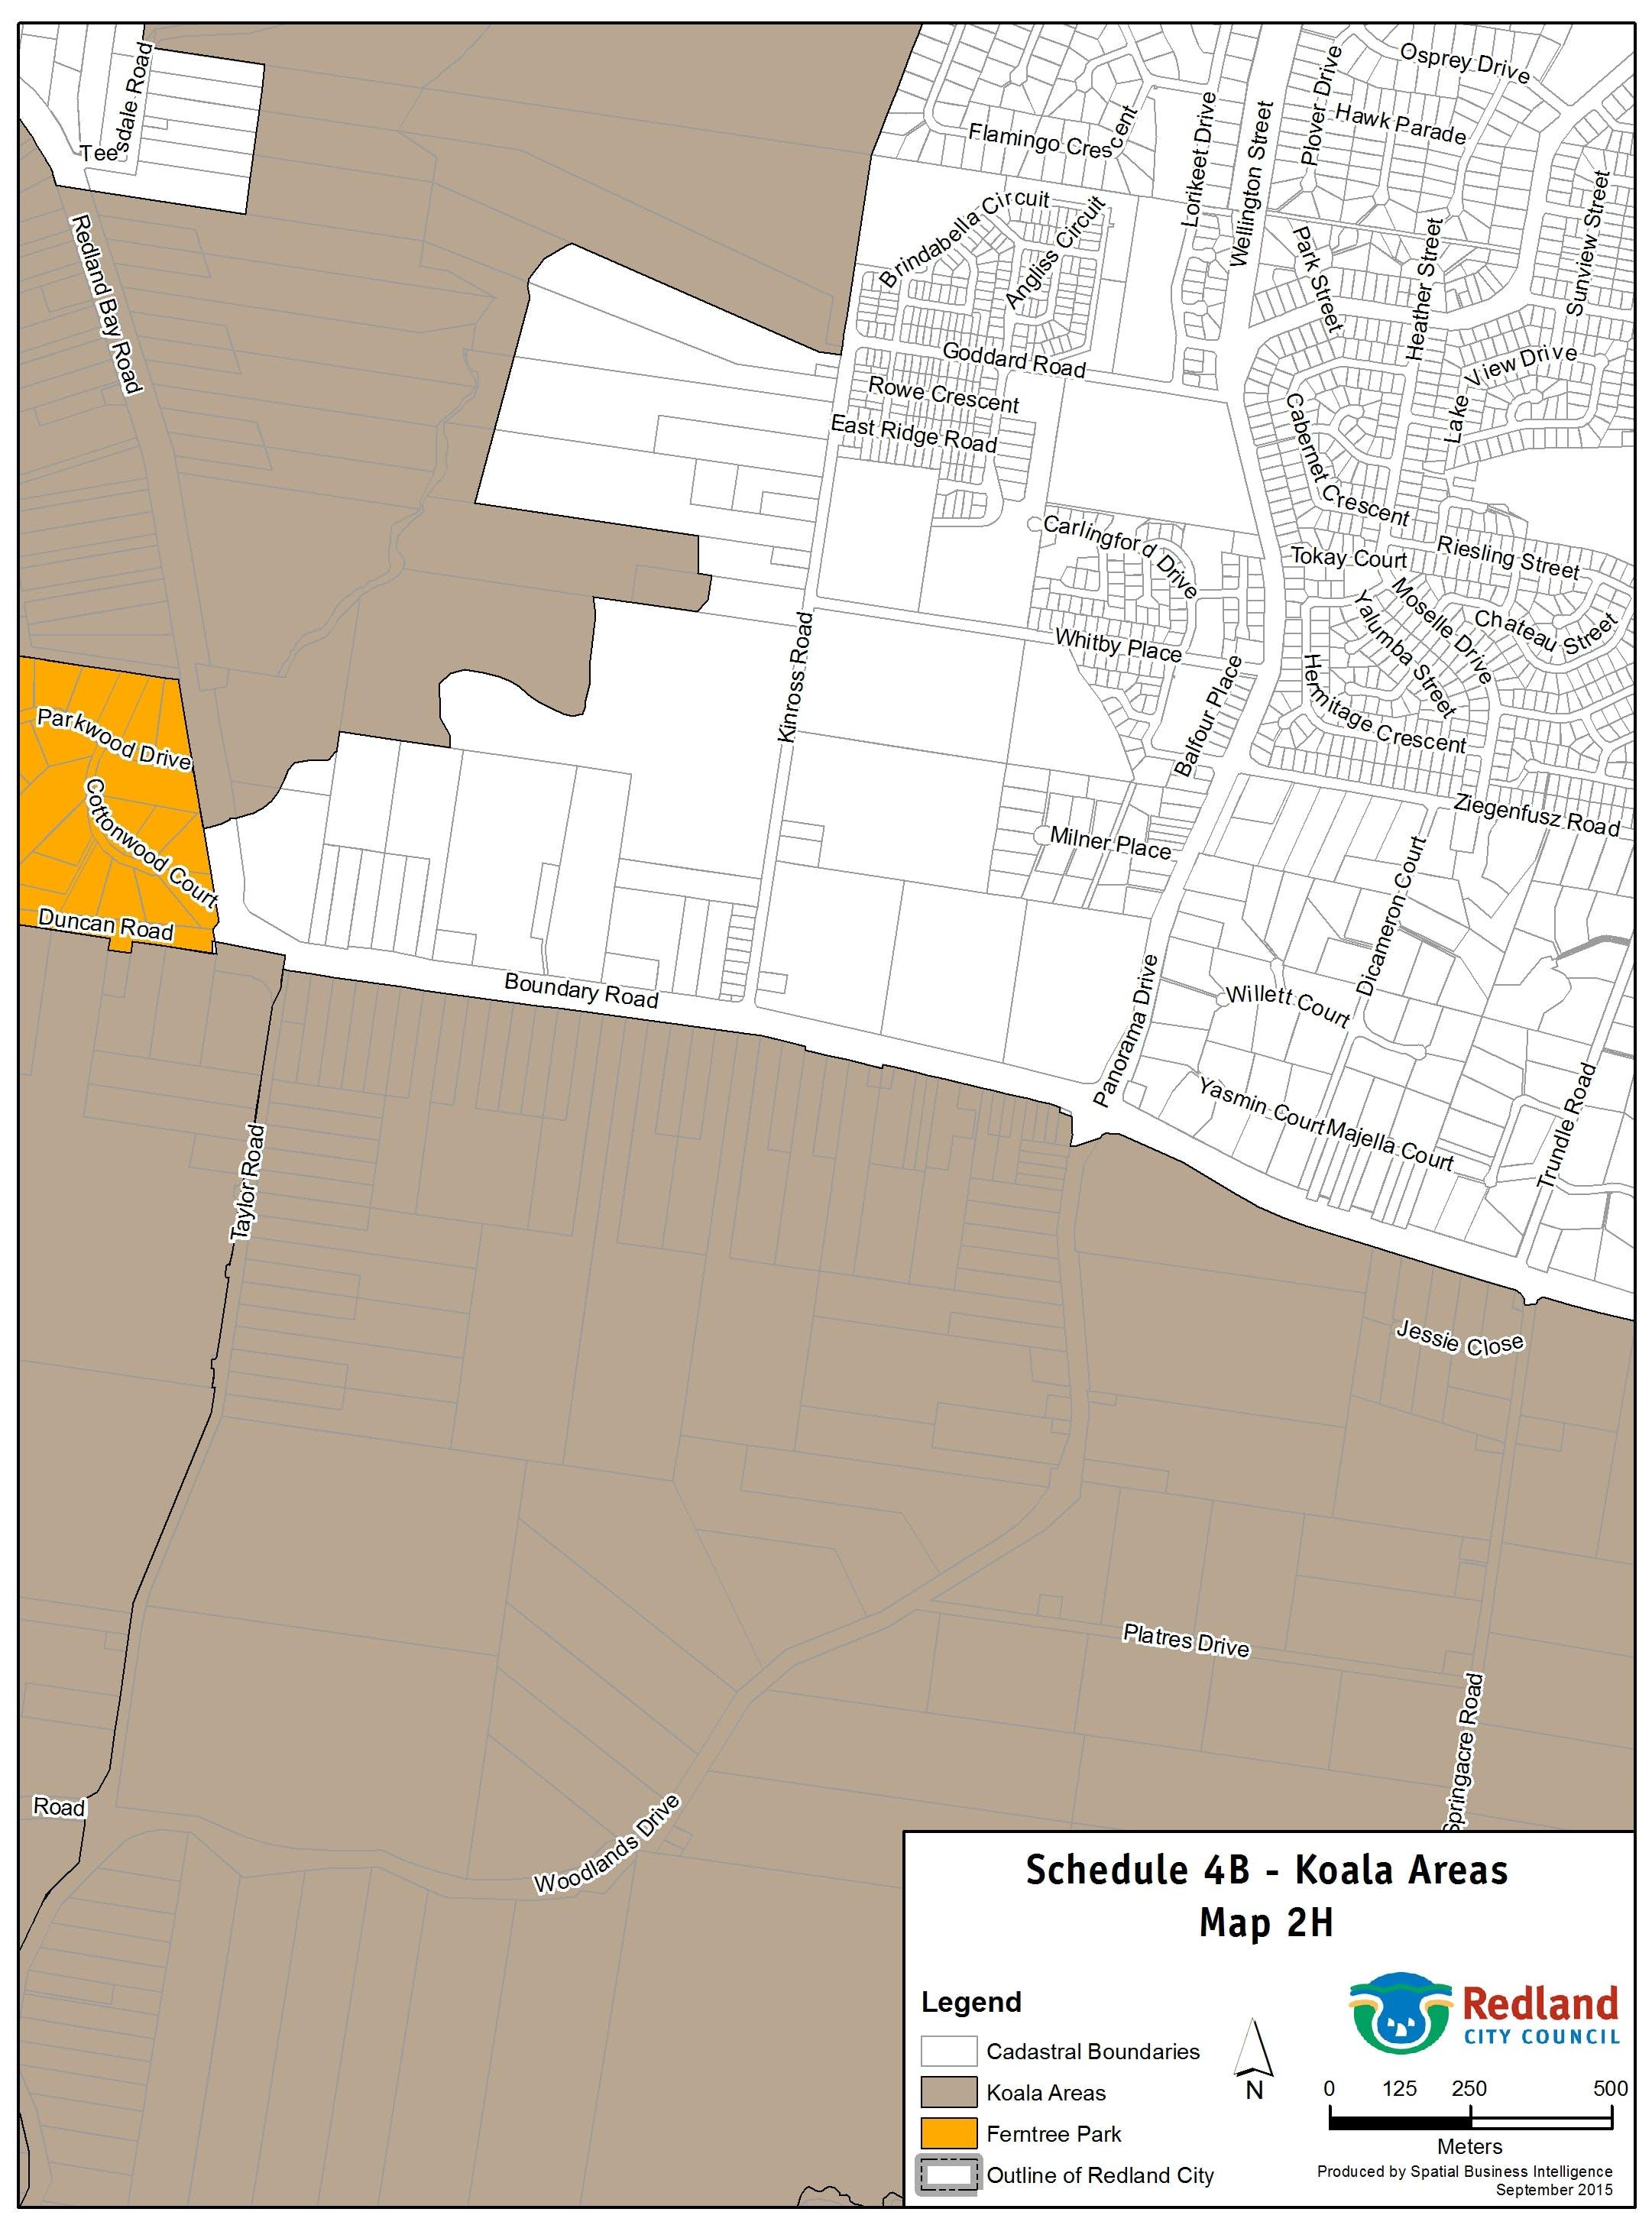 Koala Areas - Map 2H